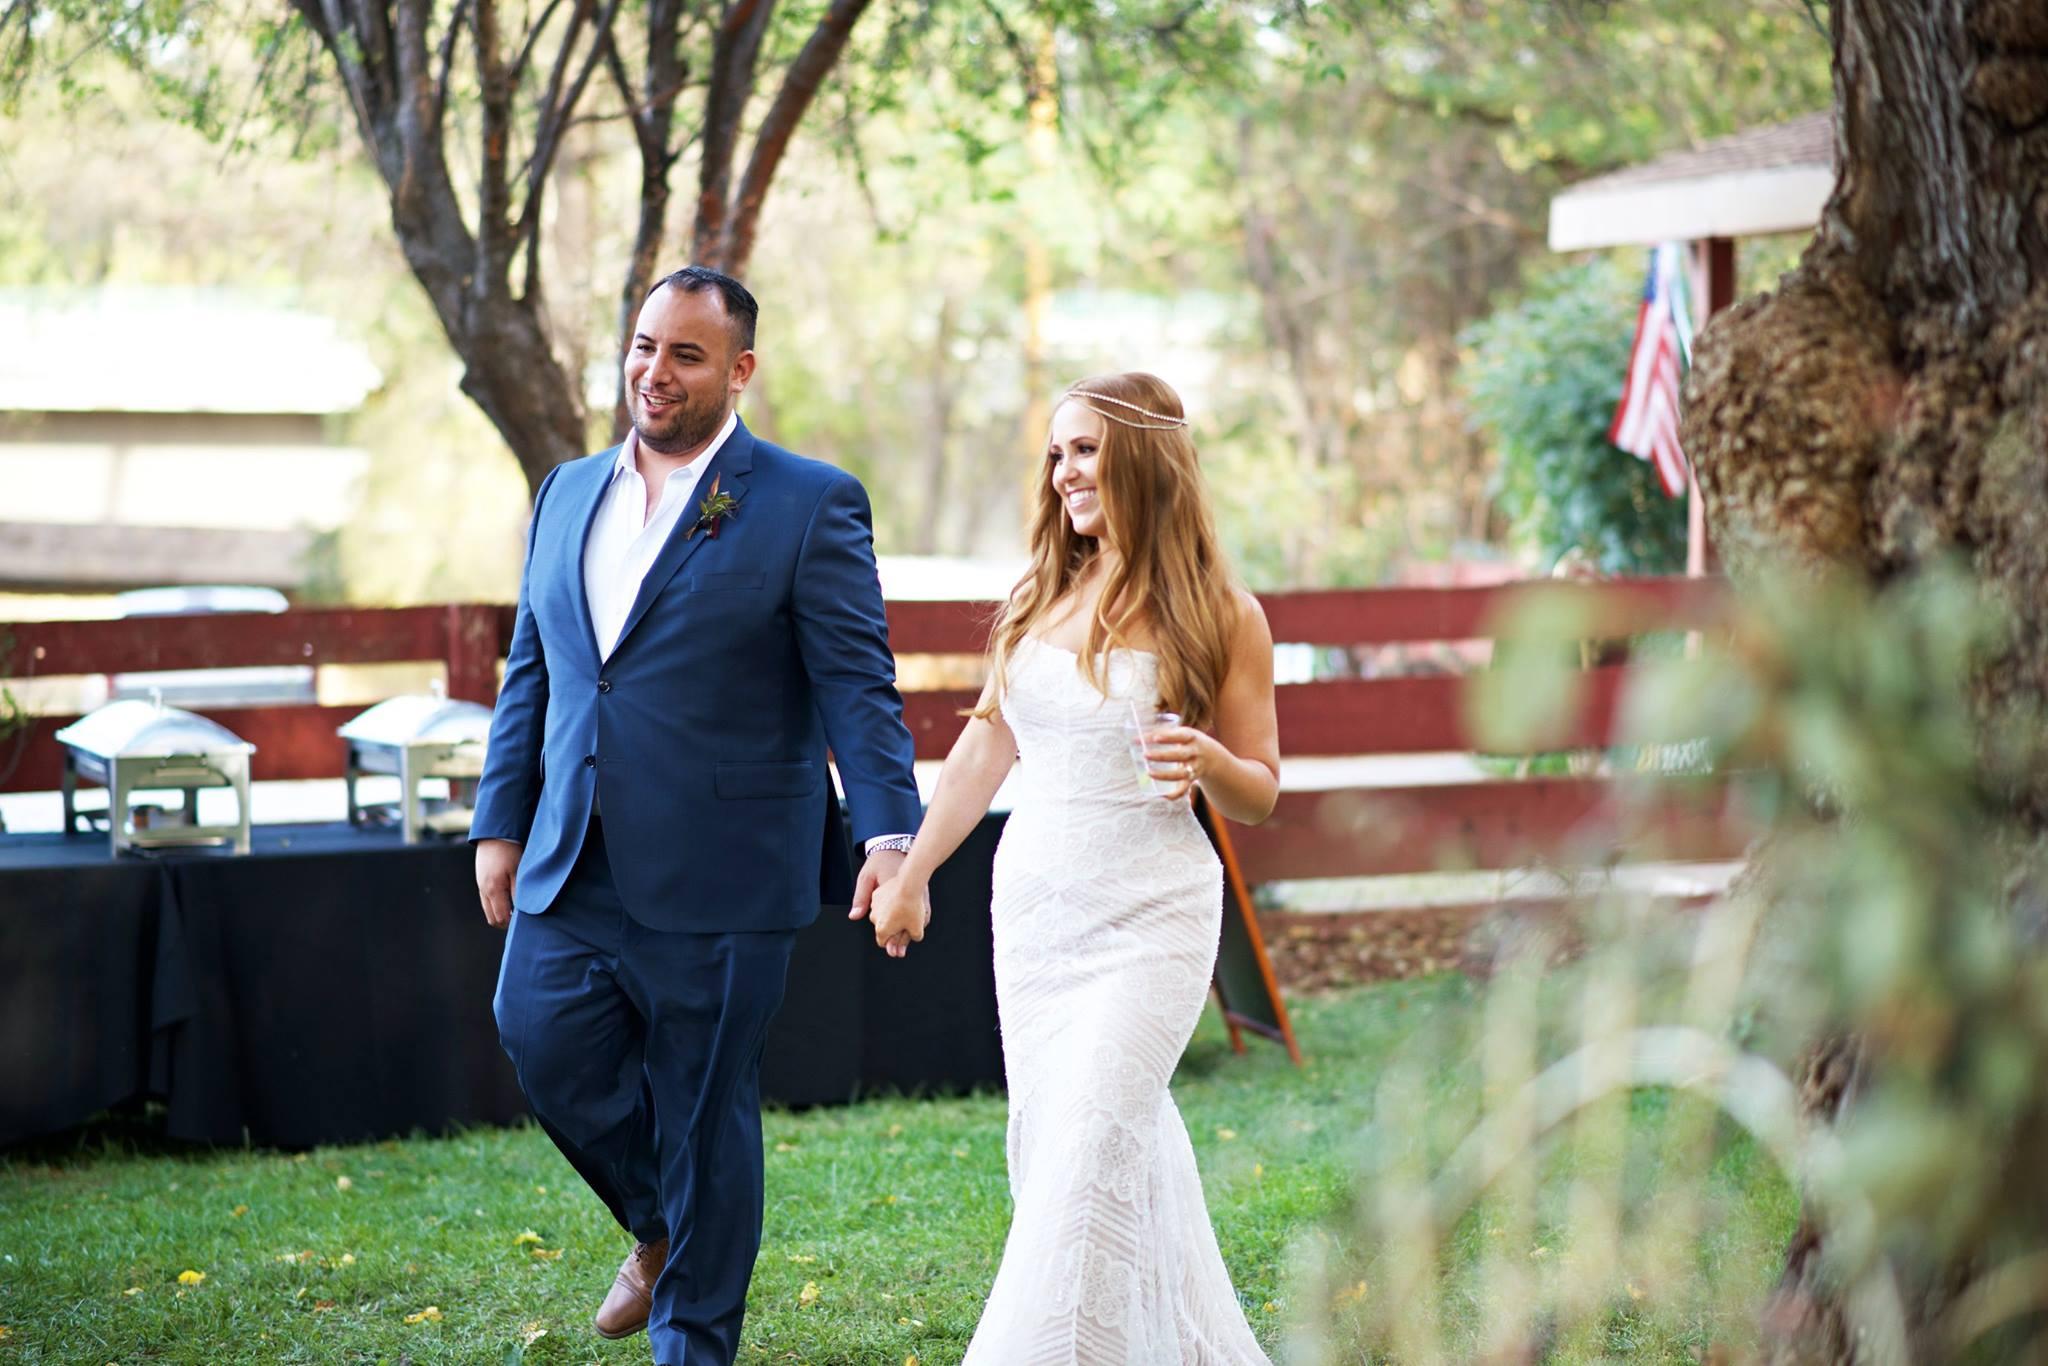 wedding image 36.jpg